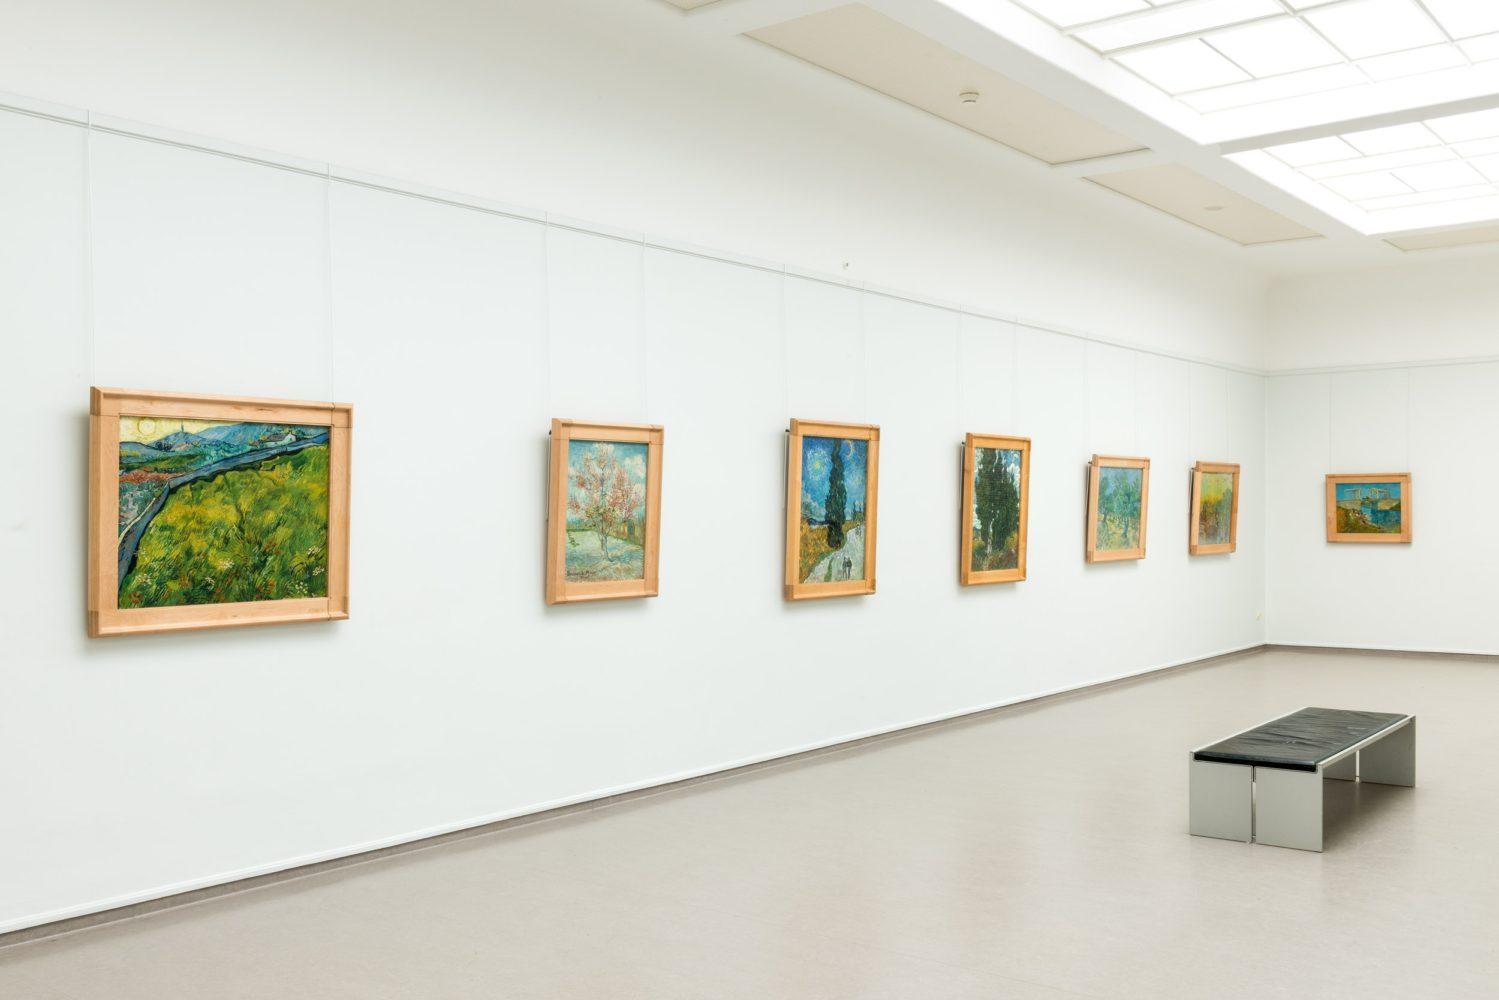 nstallation-van-gogh-gallery-kroller-muller-met-artglass-protect-van-wybenga